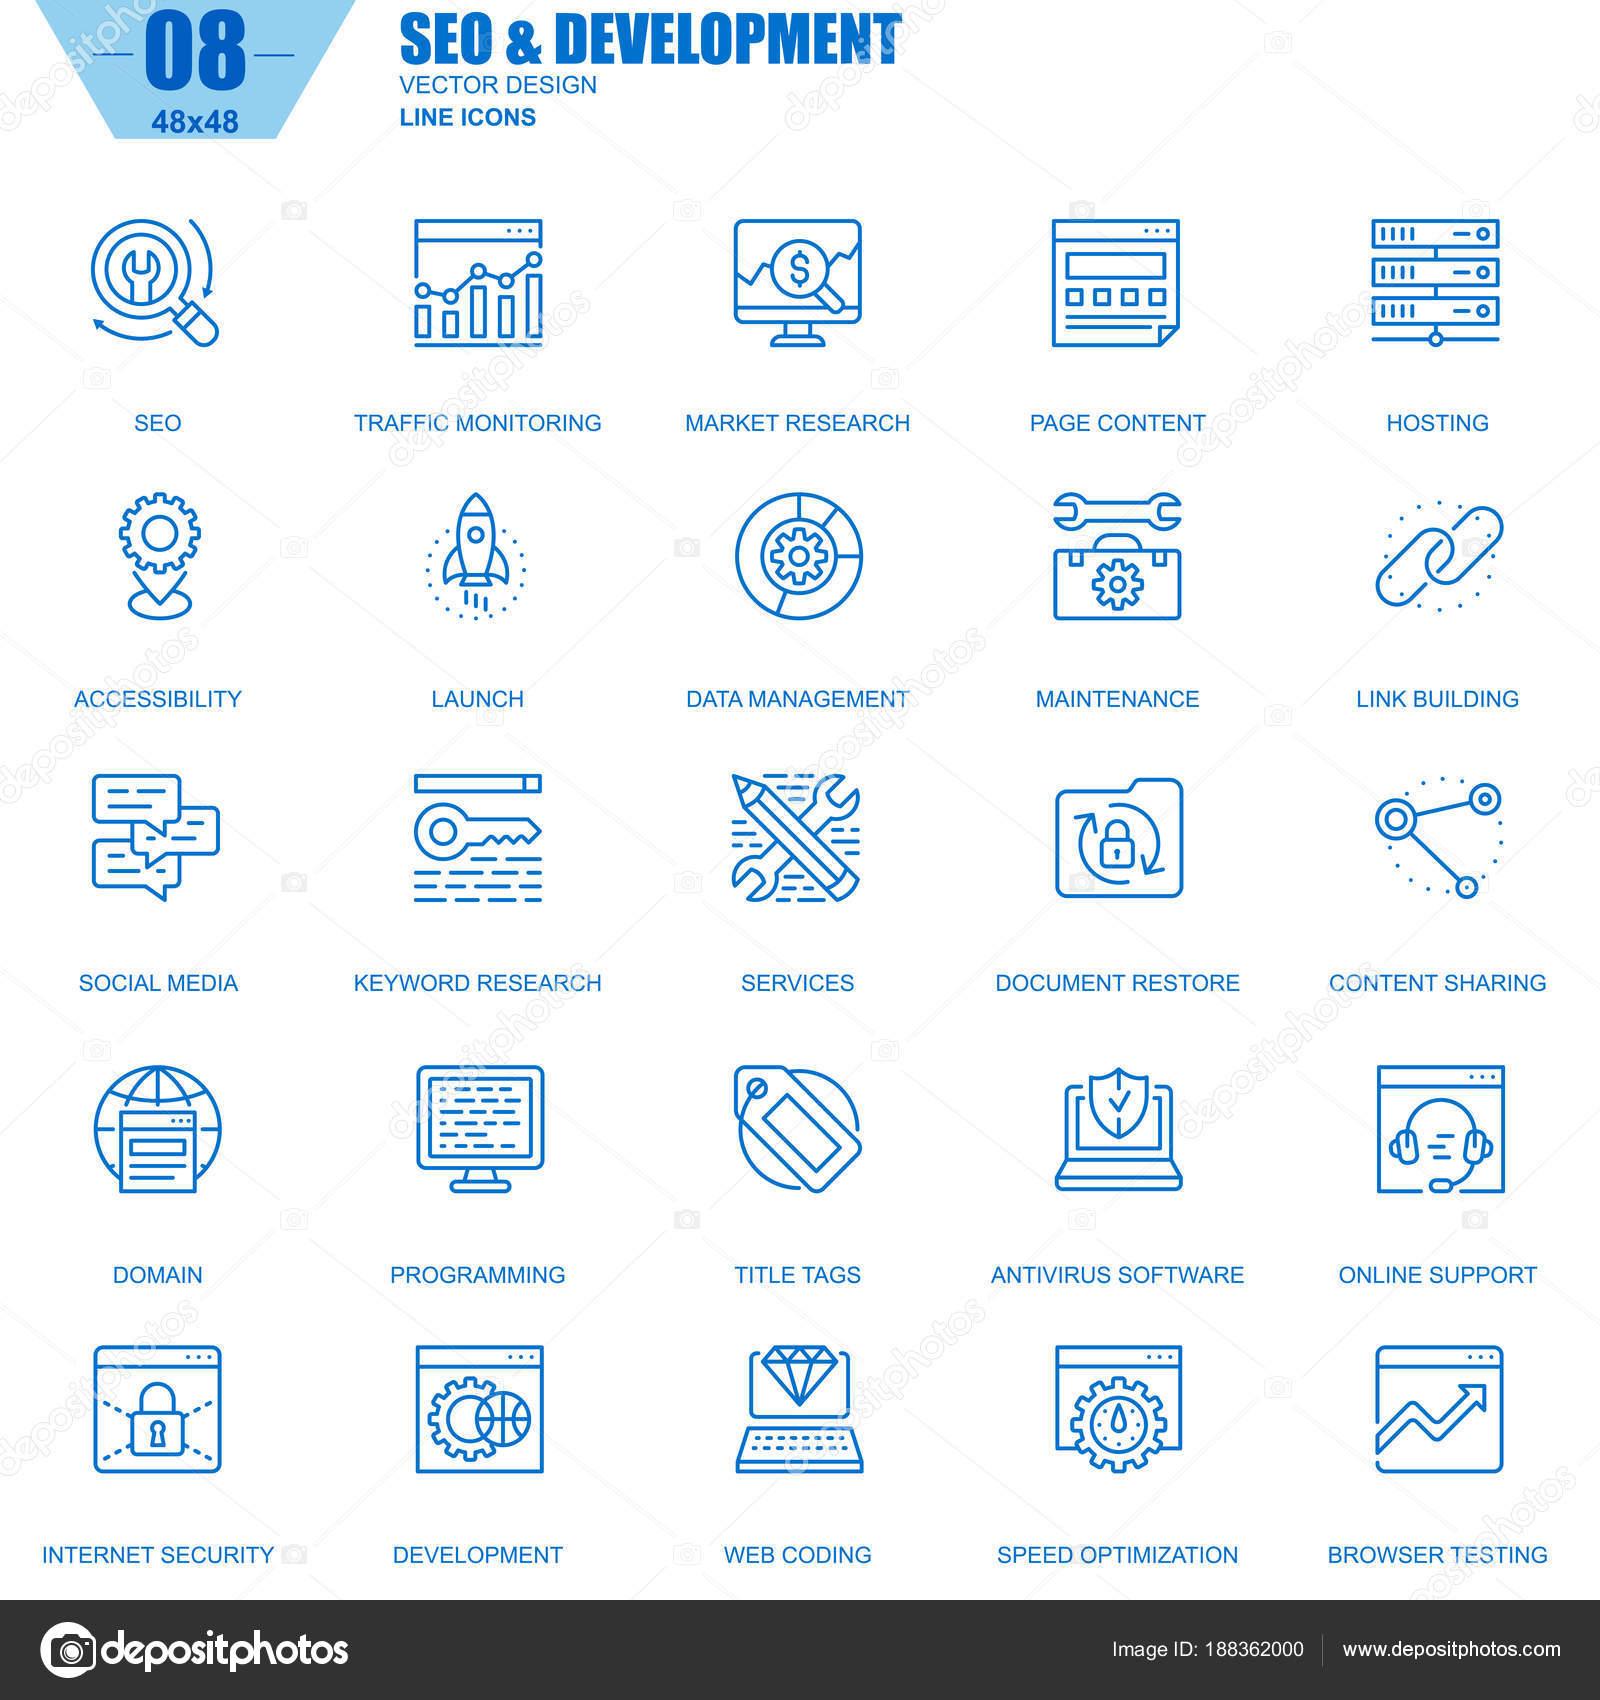 Маркетинговый план веб-сайта проверка яндекс директ